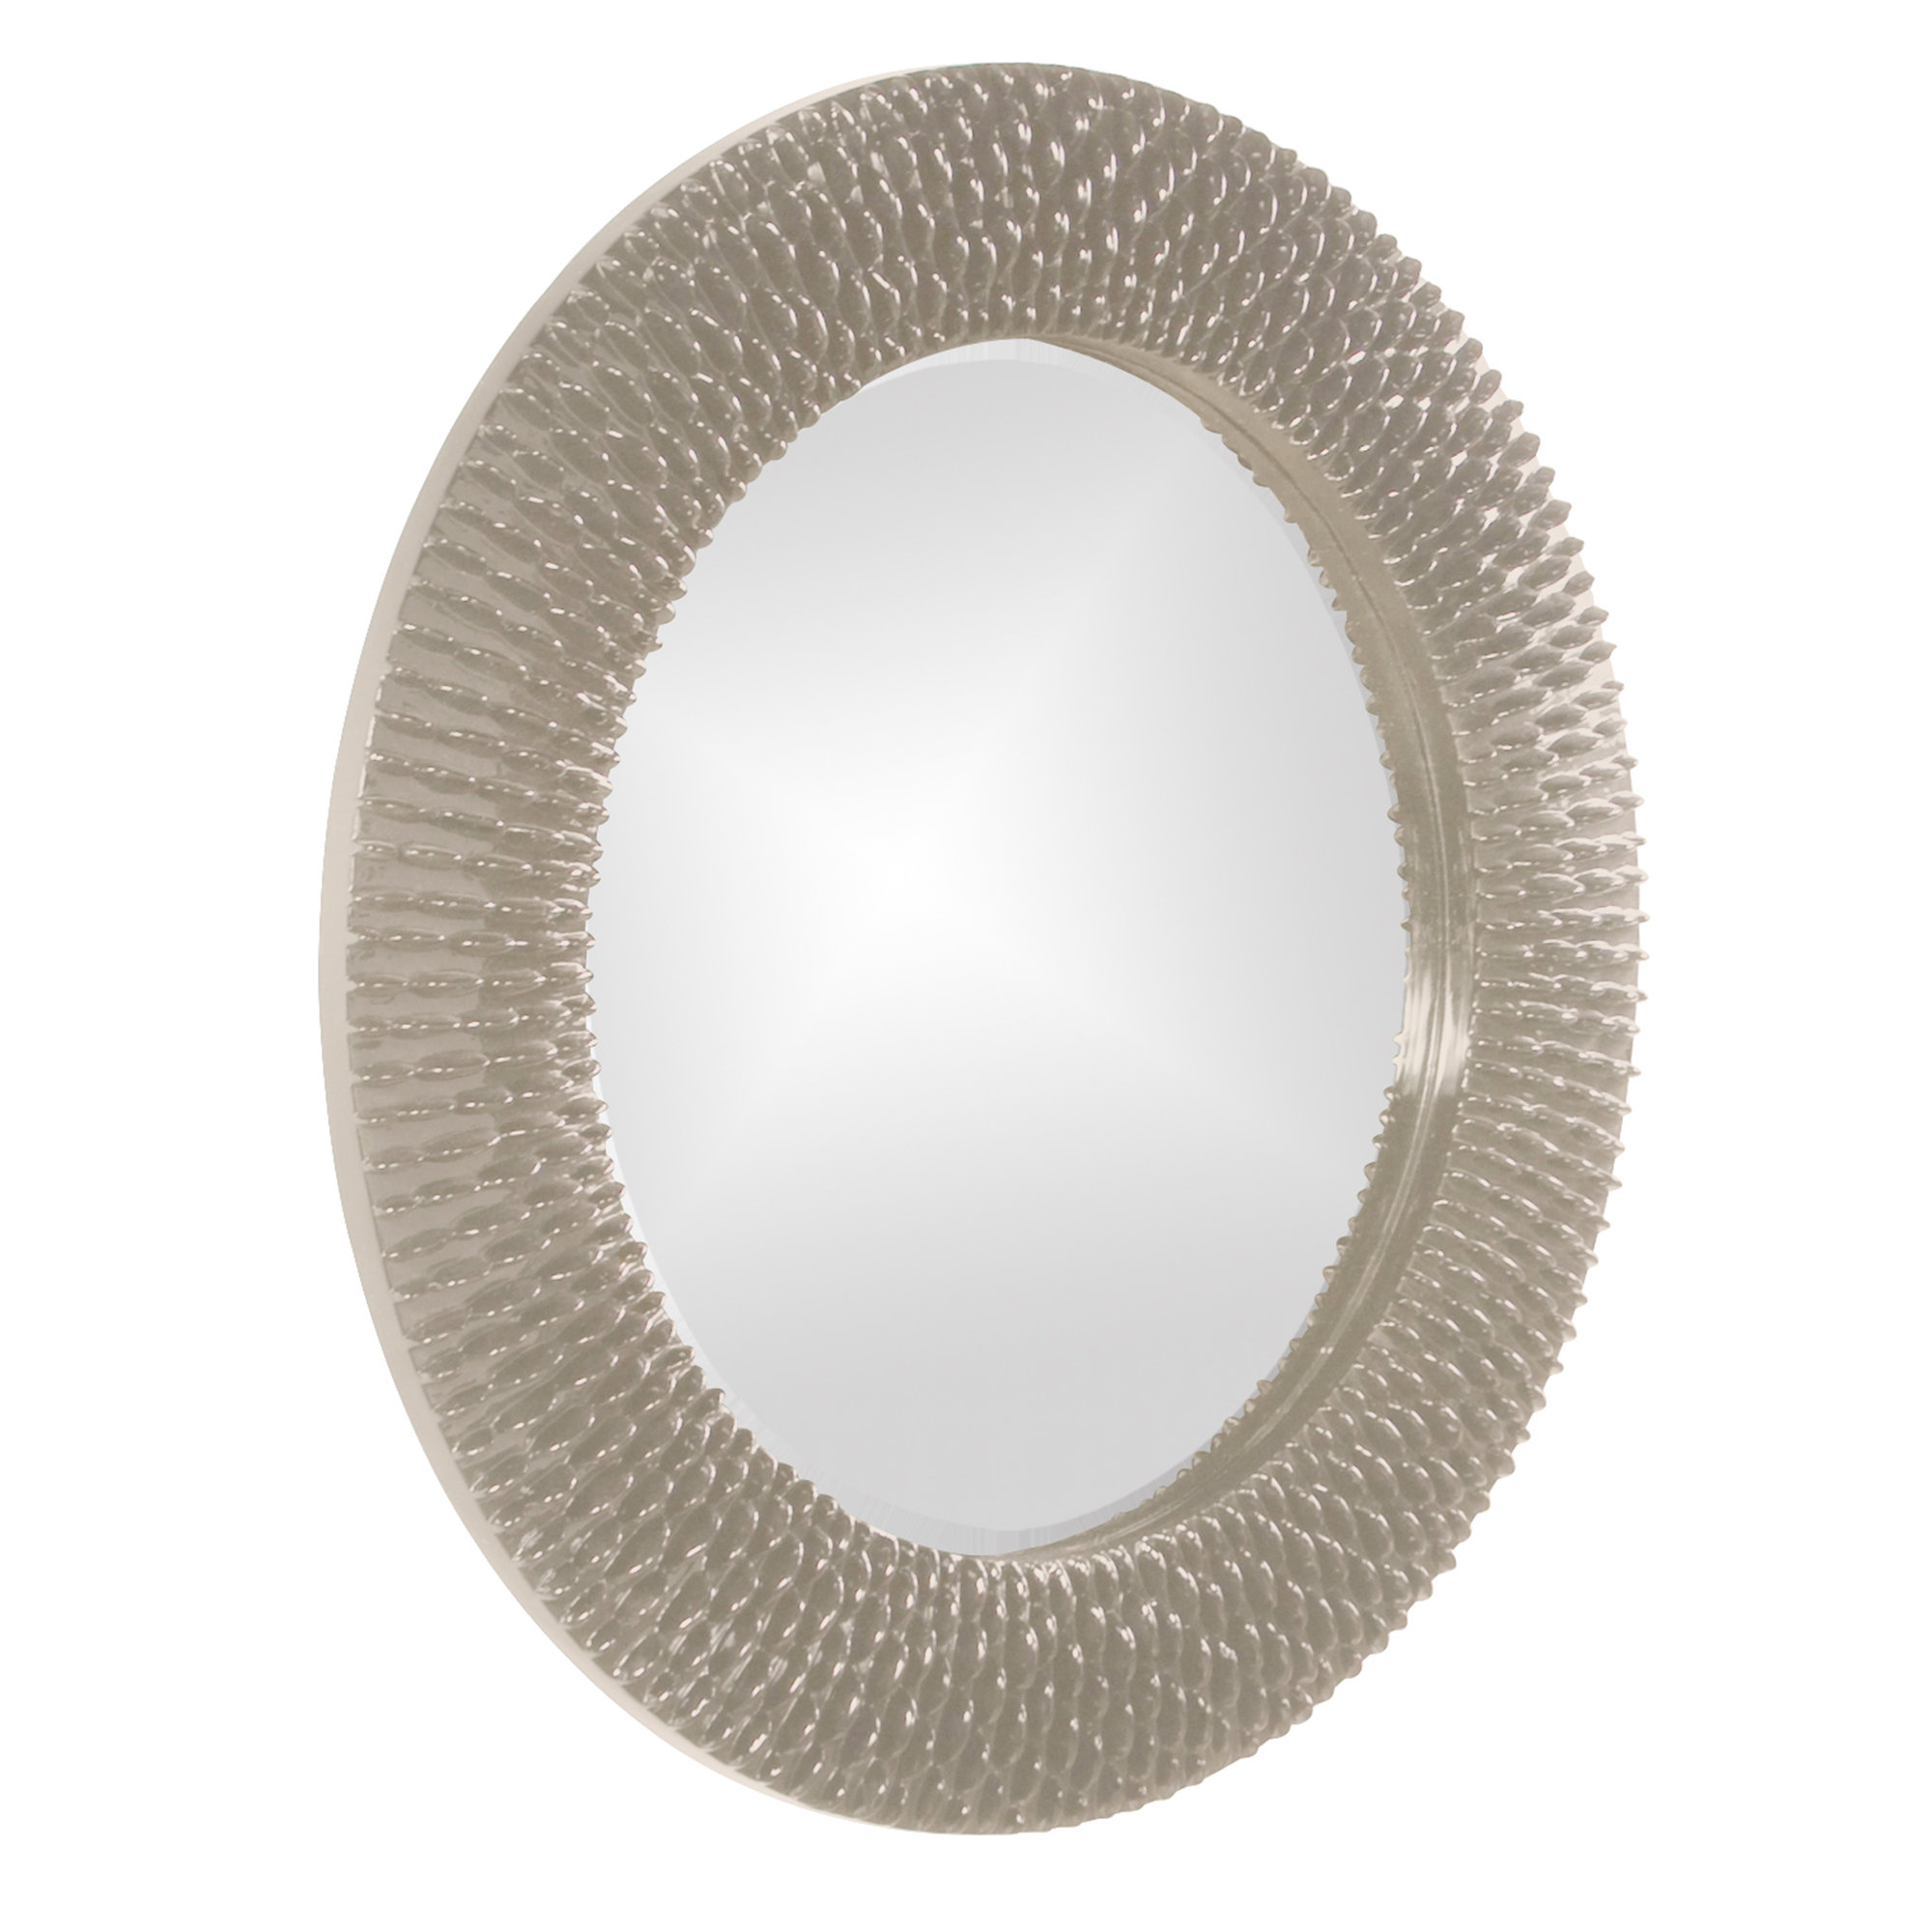 Hengelo Wall Mirror Regarding Point Reyes Molten Round Wall Mirrors (View 5 of 20)